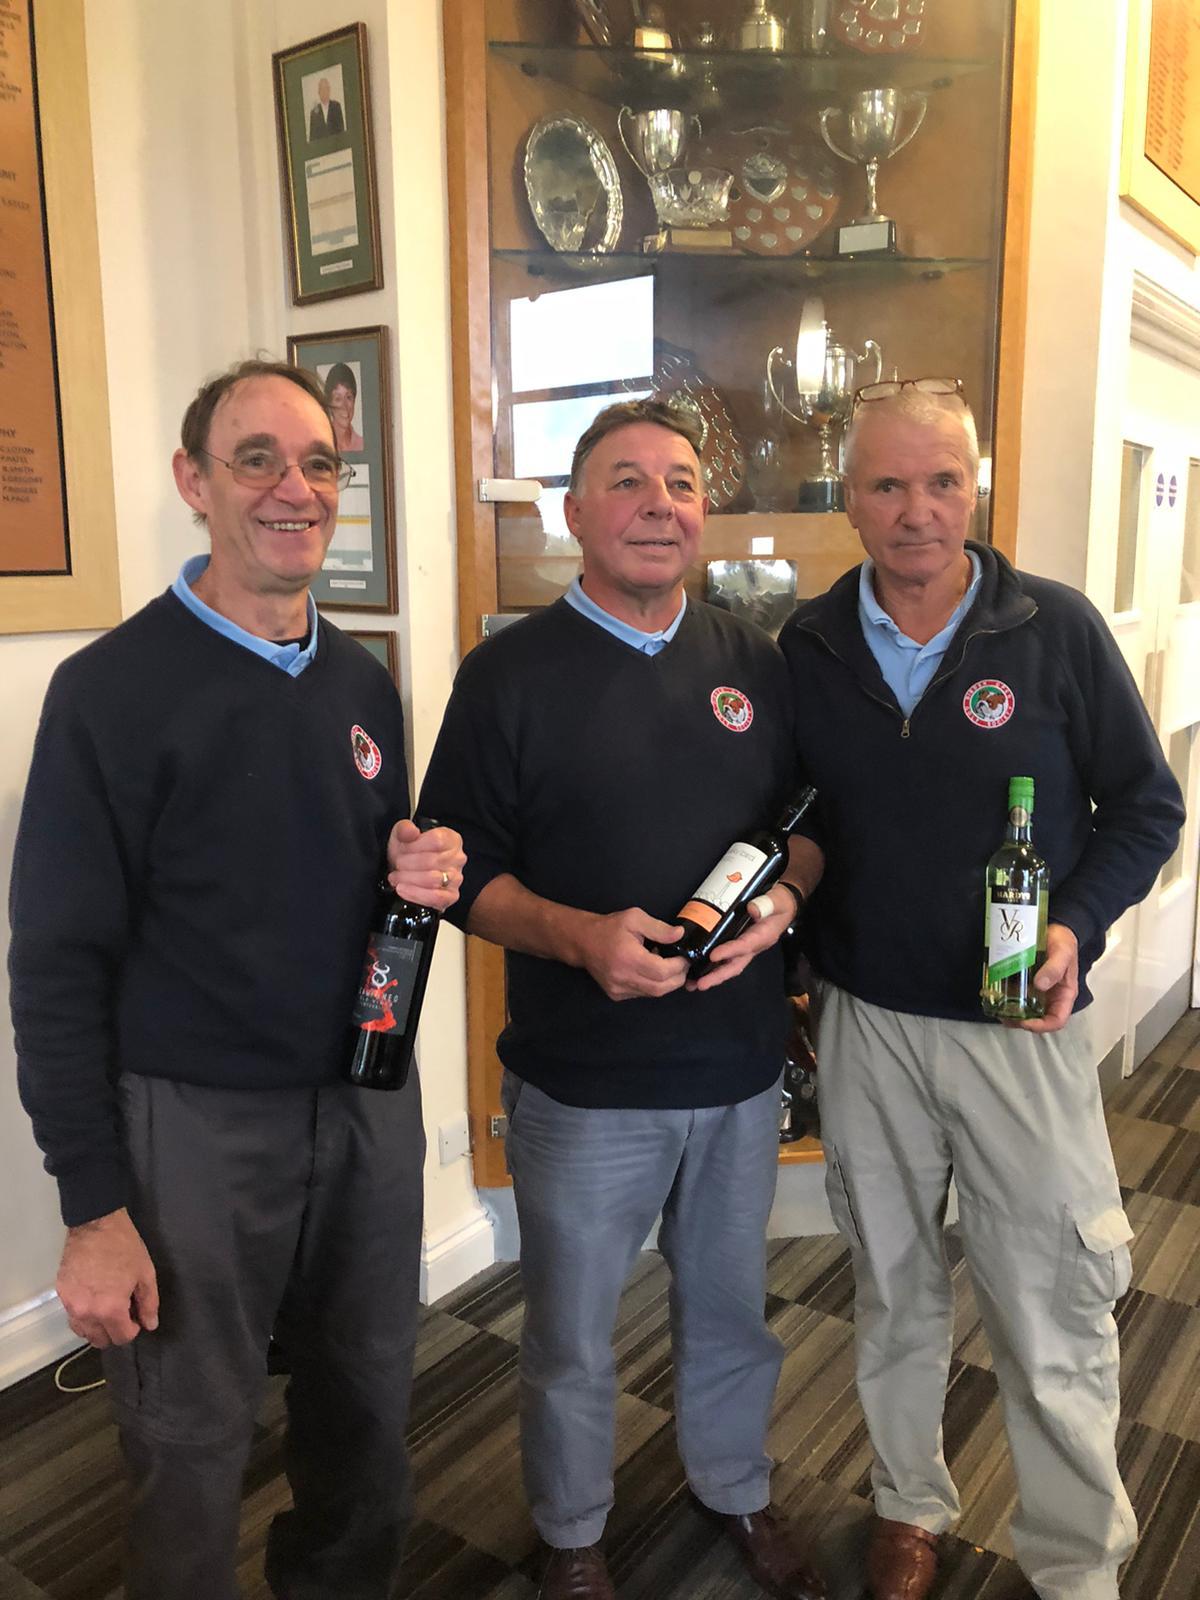 Wine winners 29 October: R James; C Bray; D Lowman